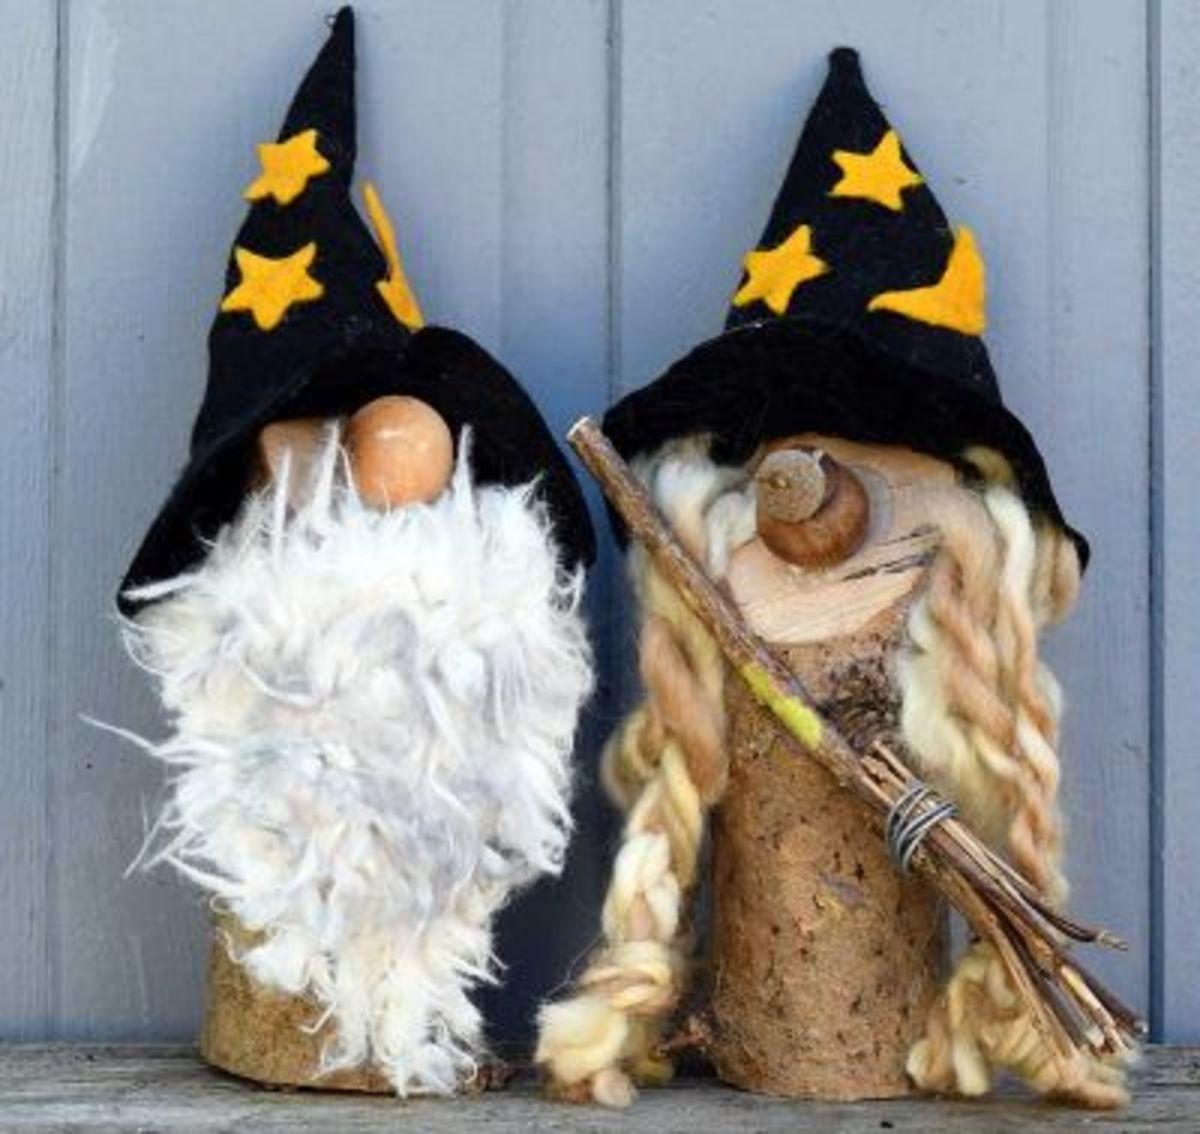 easy-and-fun-gnome-craft-ideas